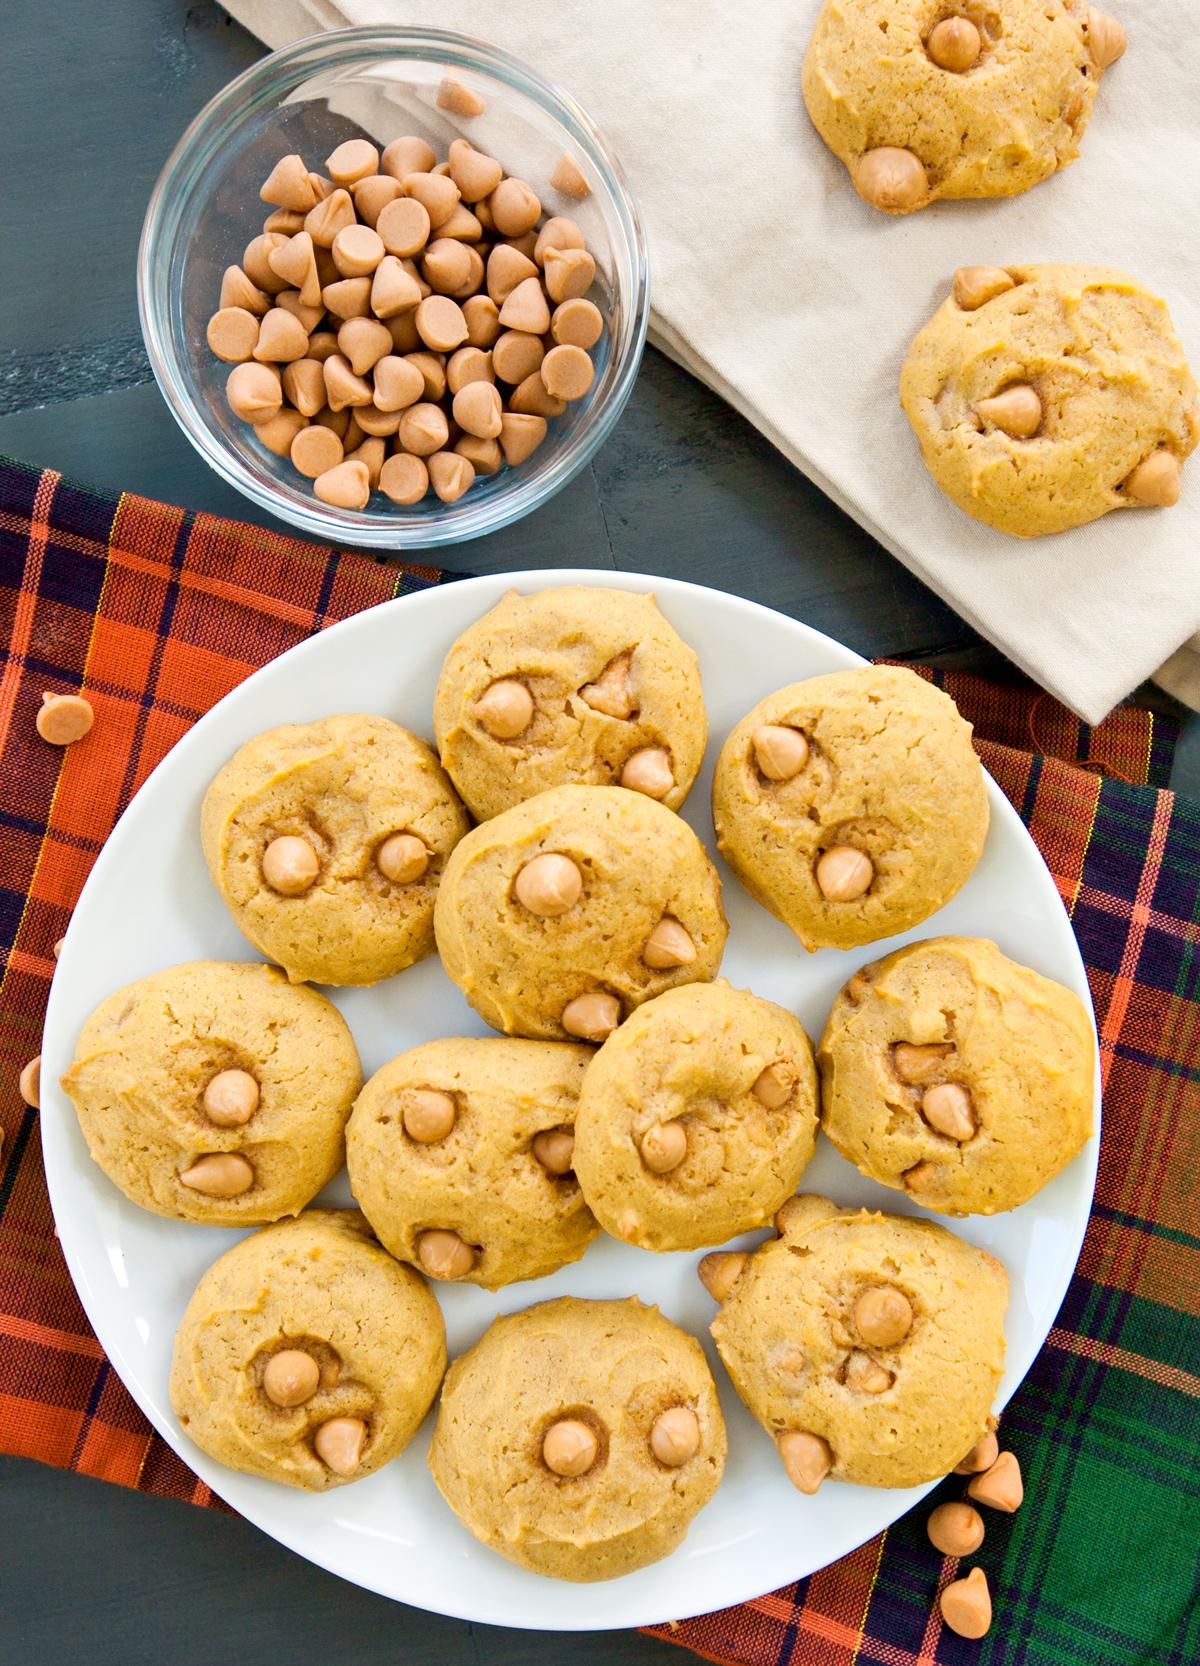 Overhead view of a plate of small pumpkin butterscotch cookies